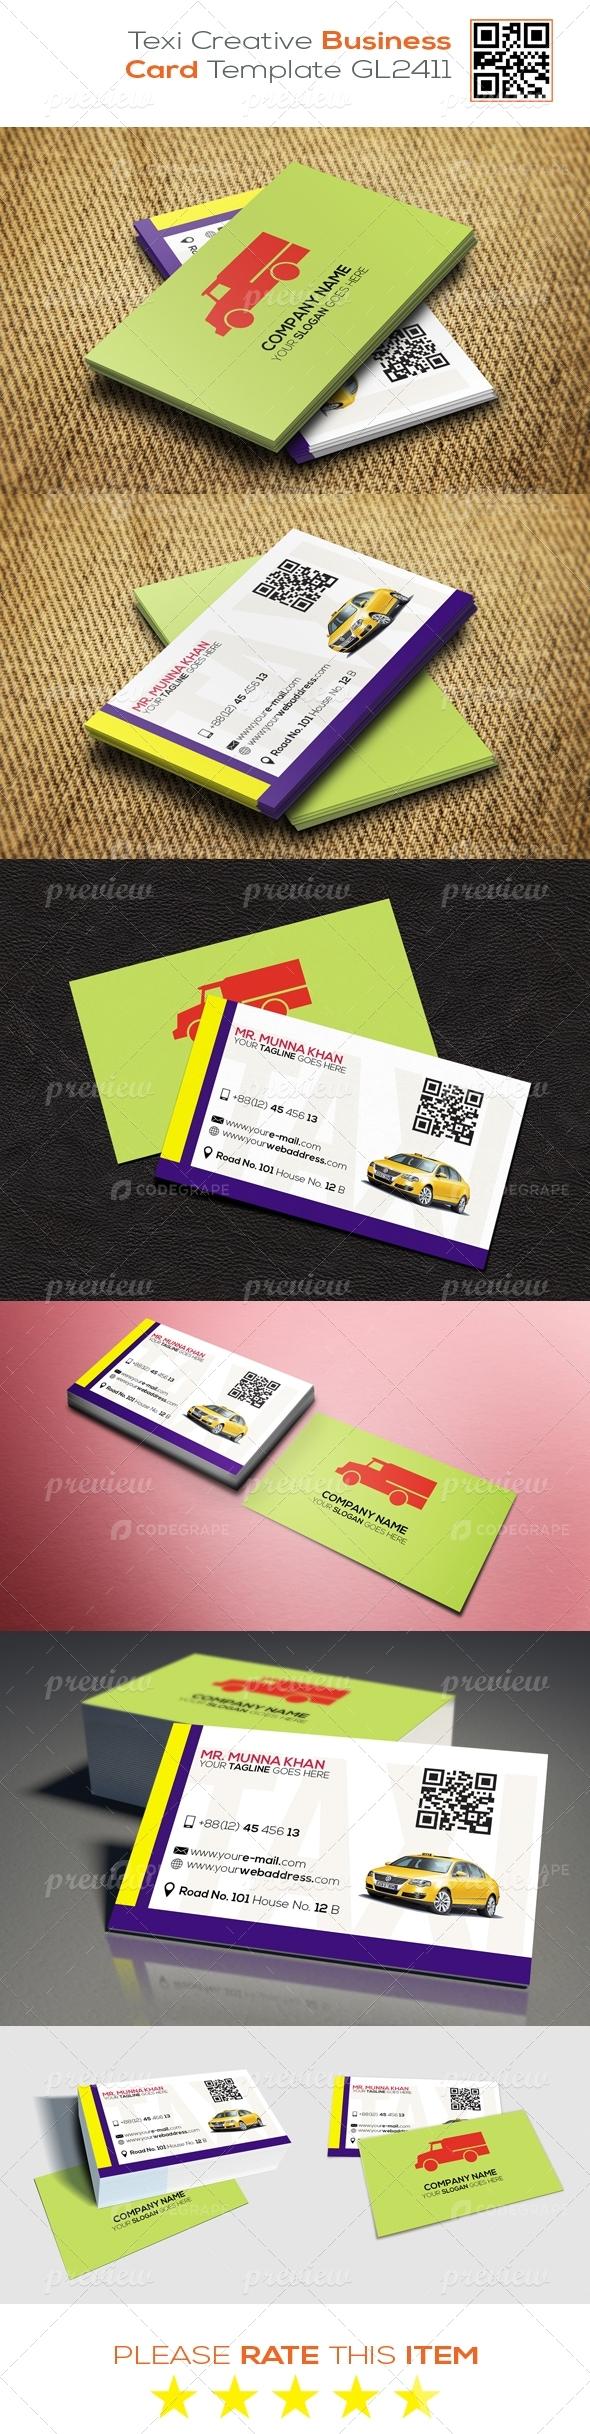 Texi Creative Business Card Template GL2411